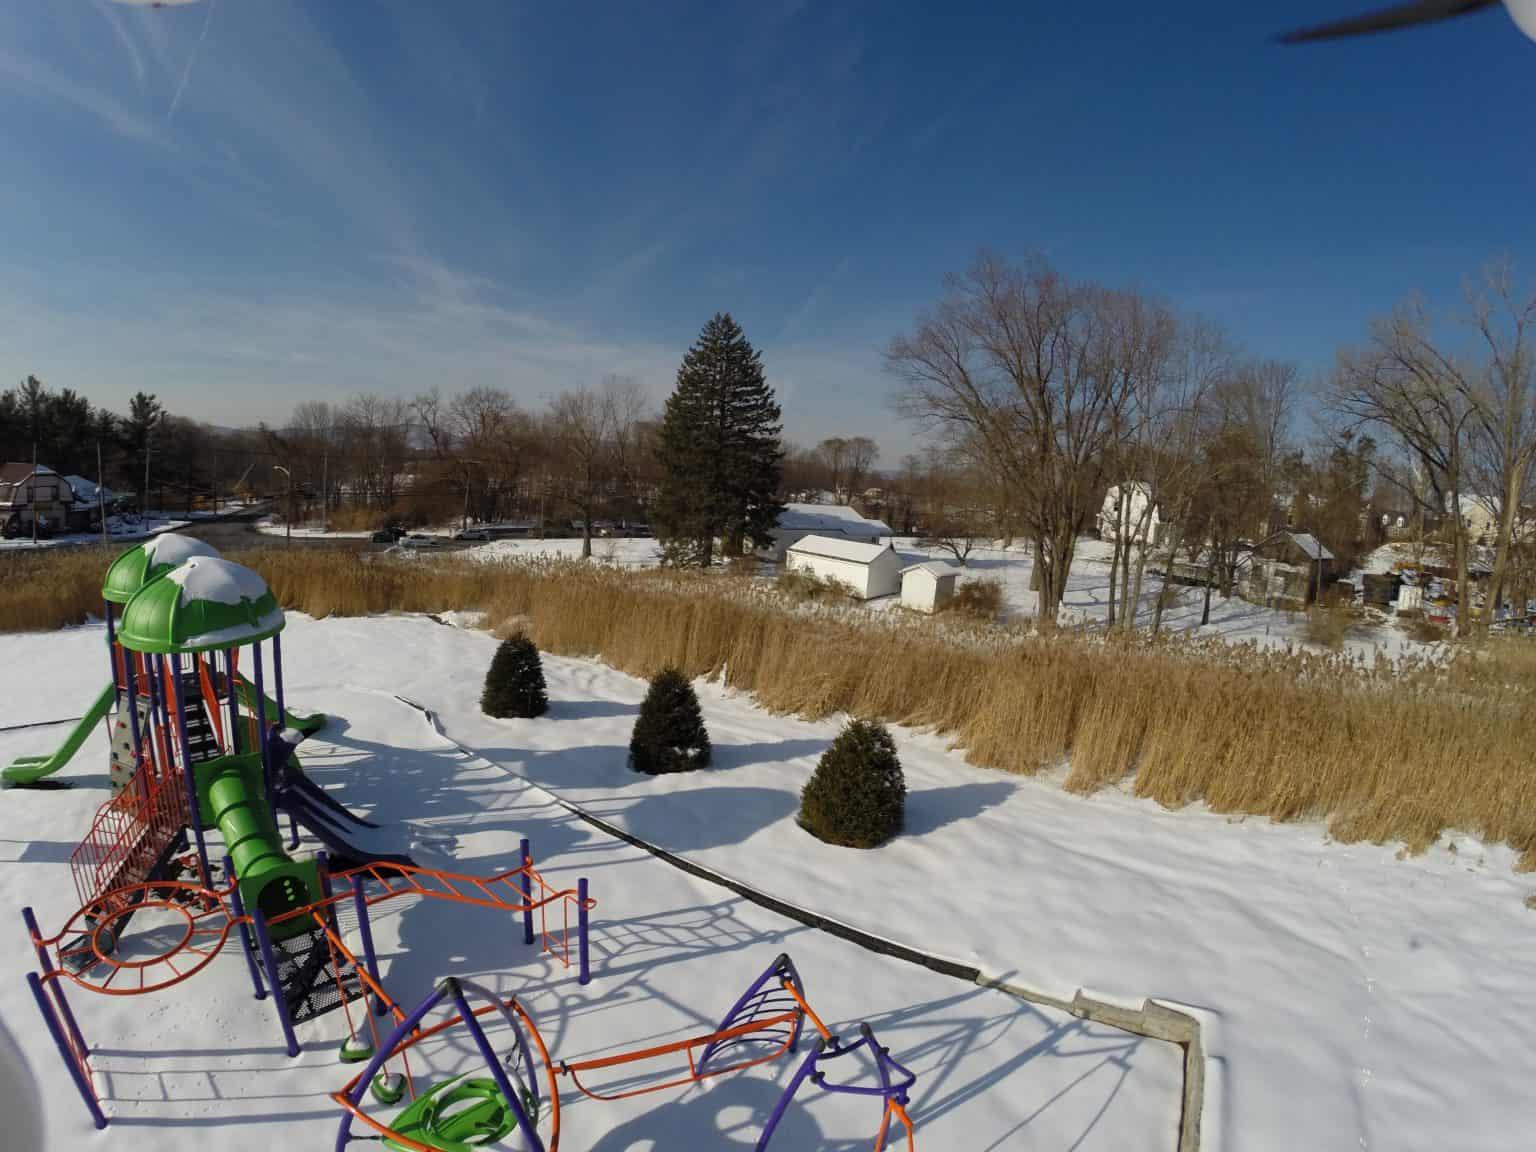 wiss-park-playground-wayne-nj_11653366126_o-1536x1152